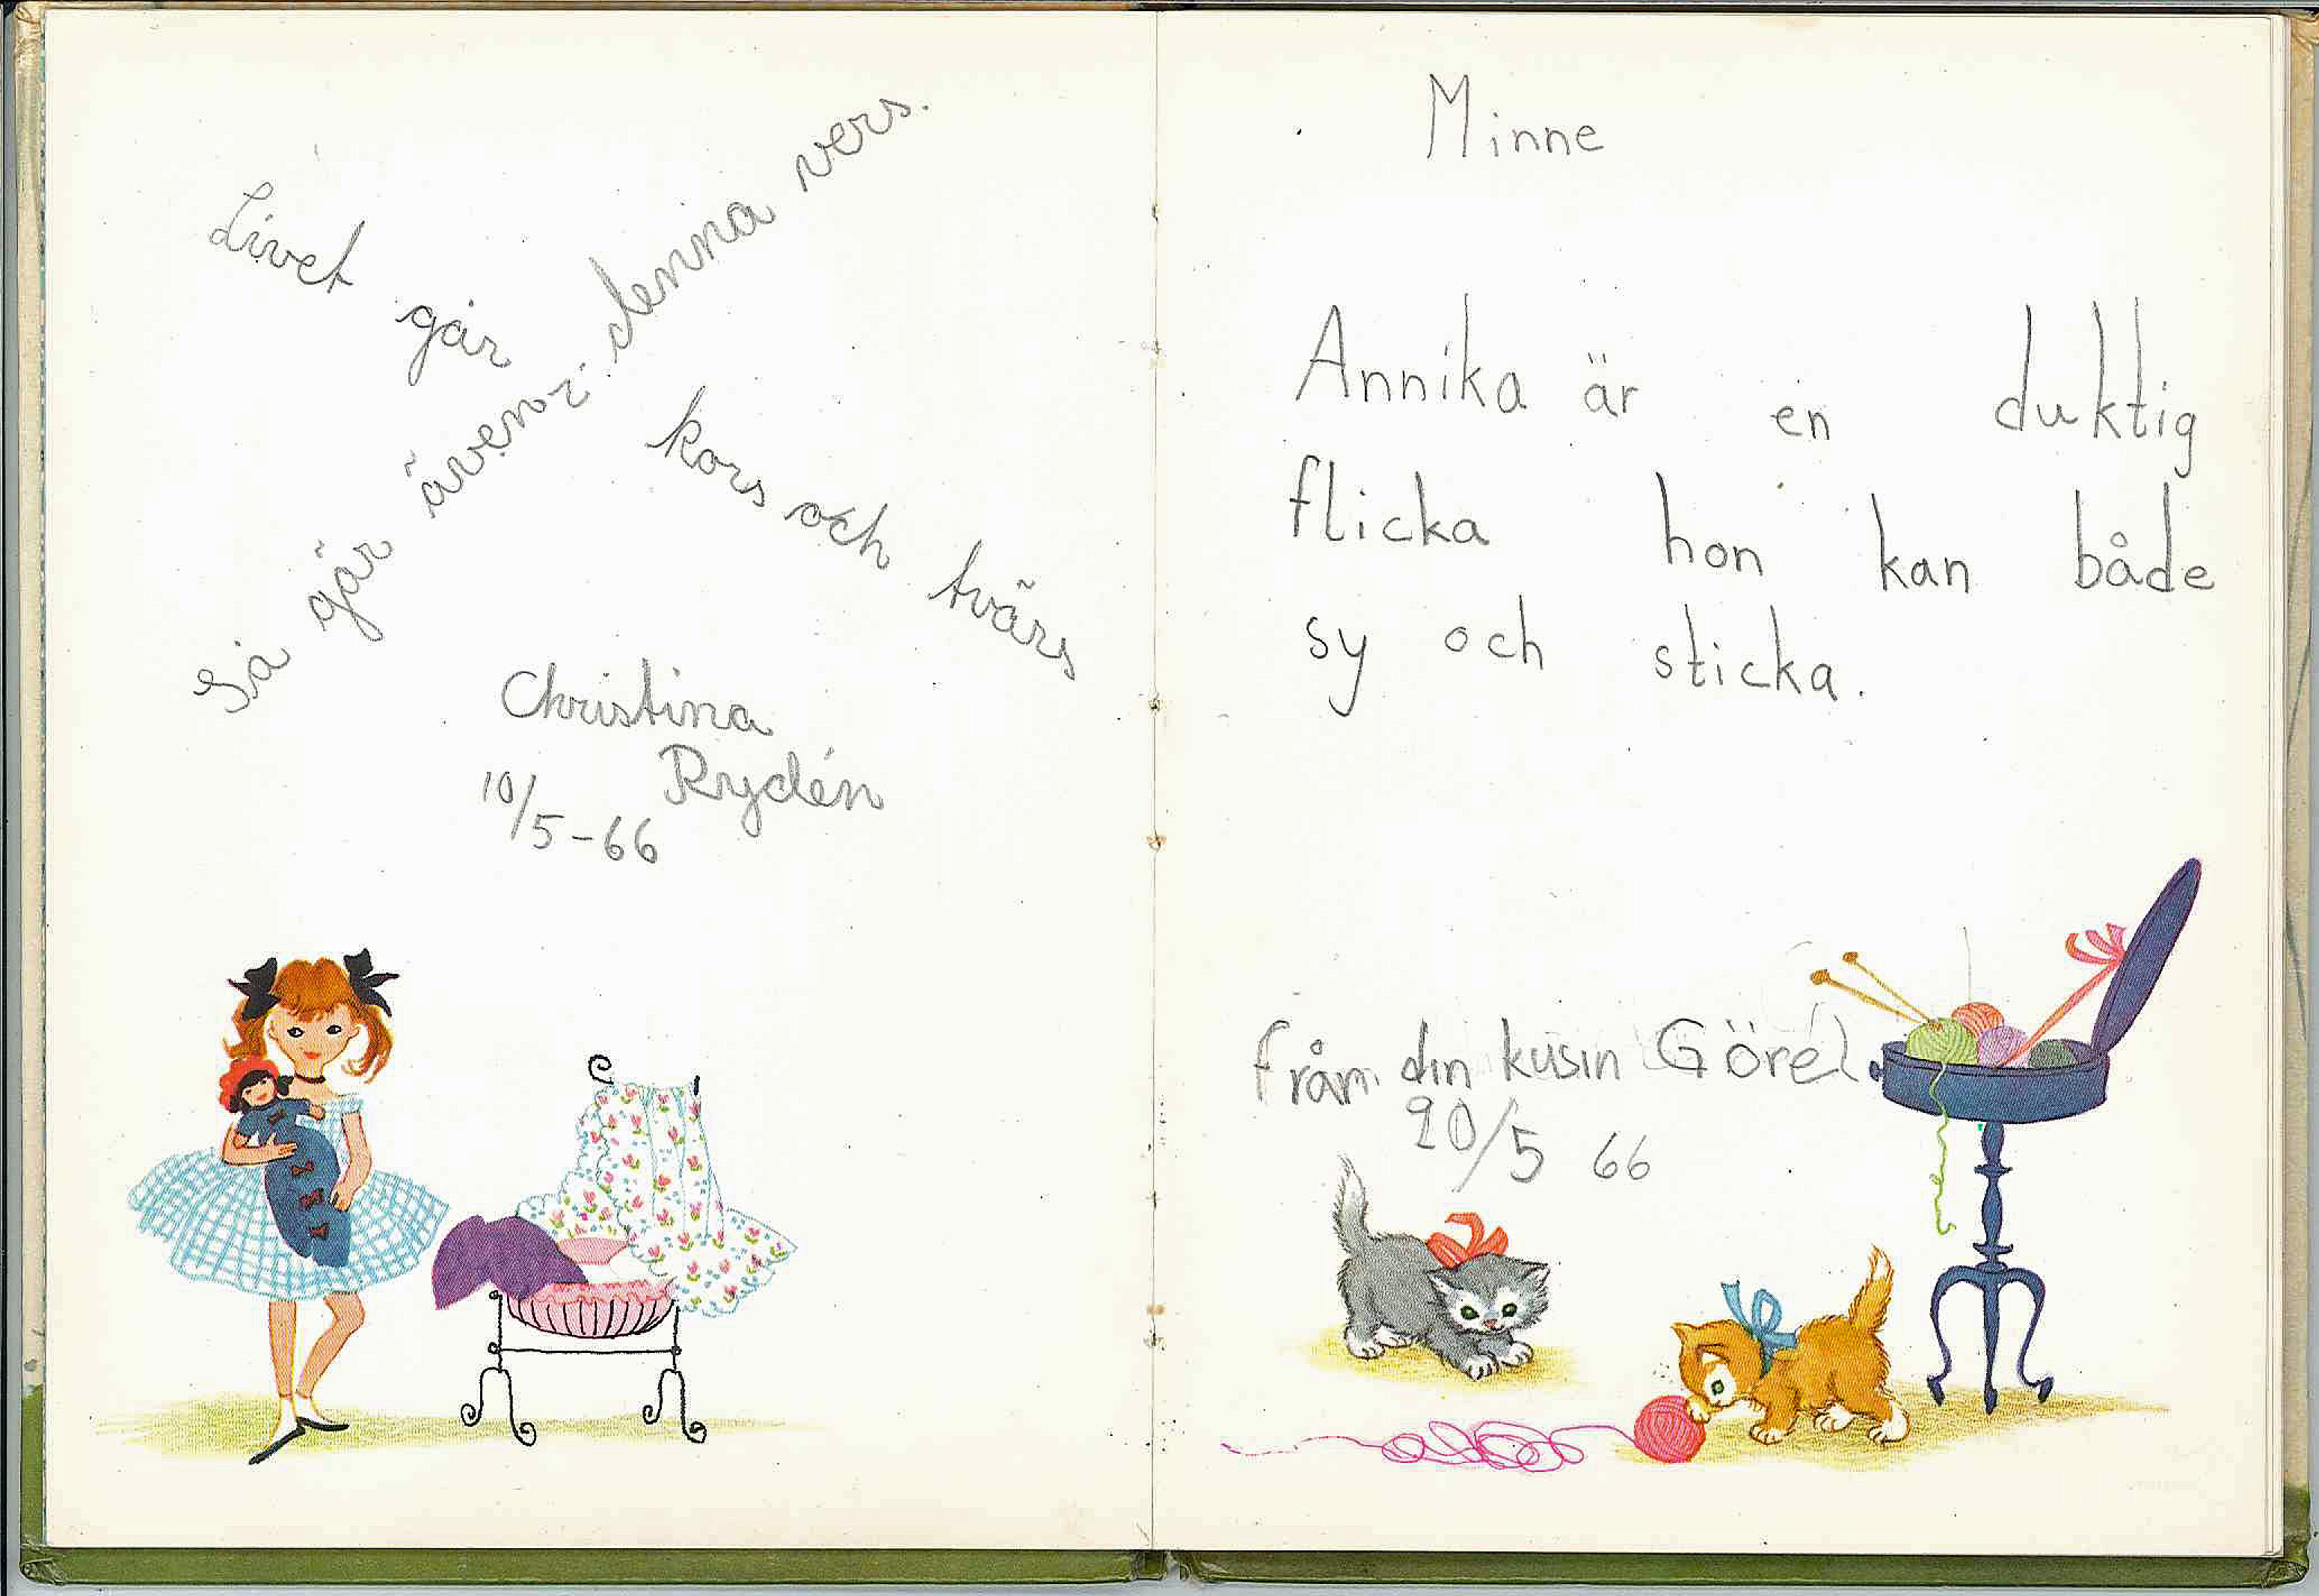 femtio års rim Poesiboken | Bubblan i bibblan femtio års rim